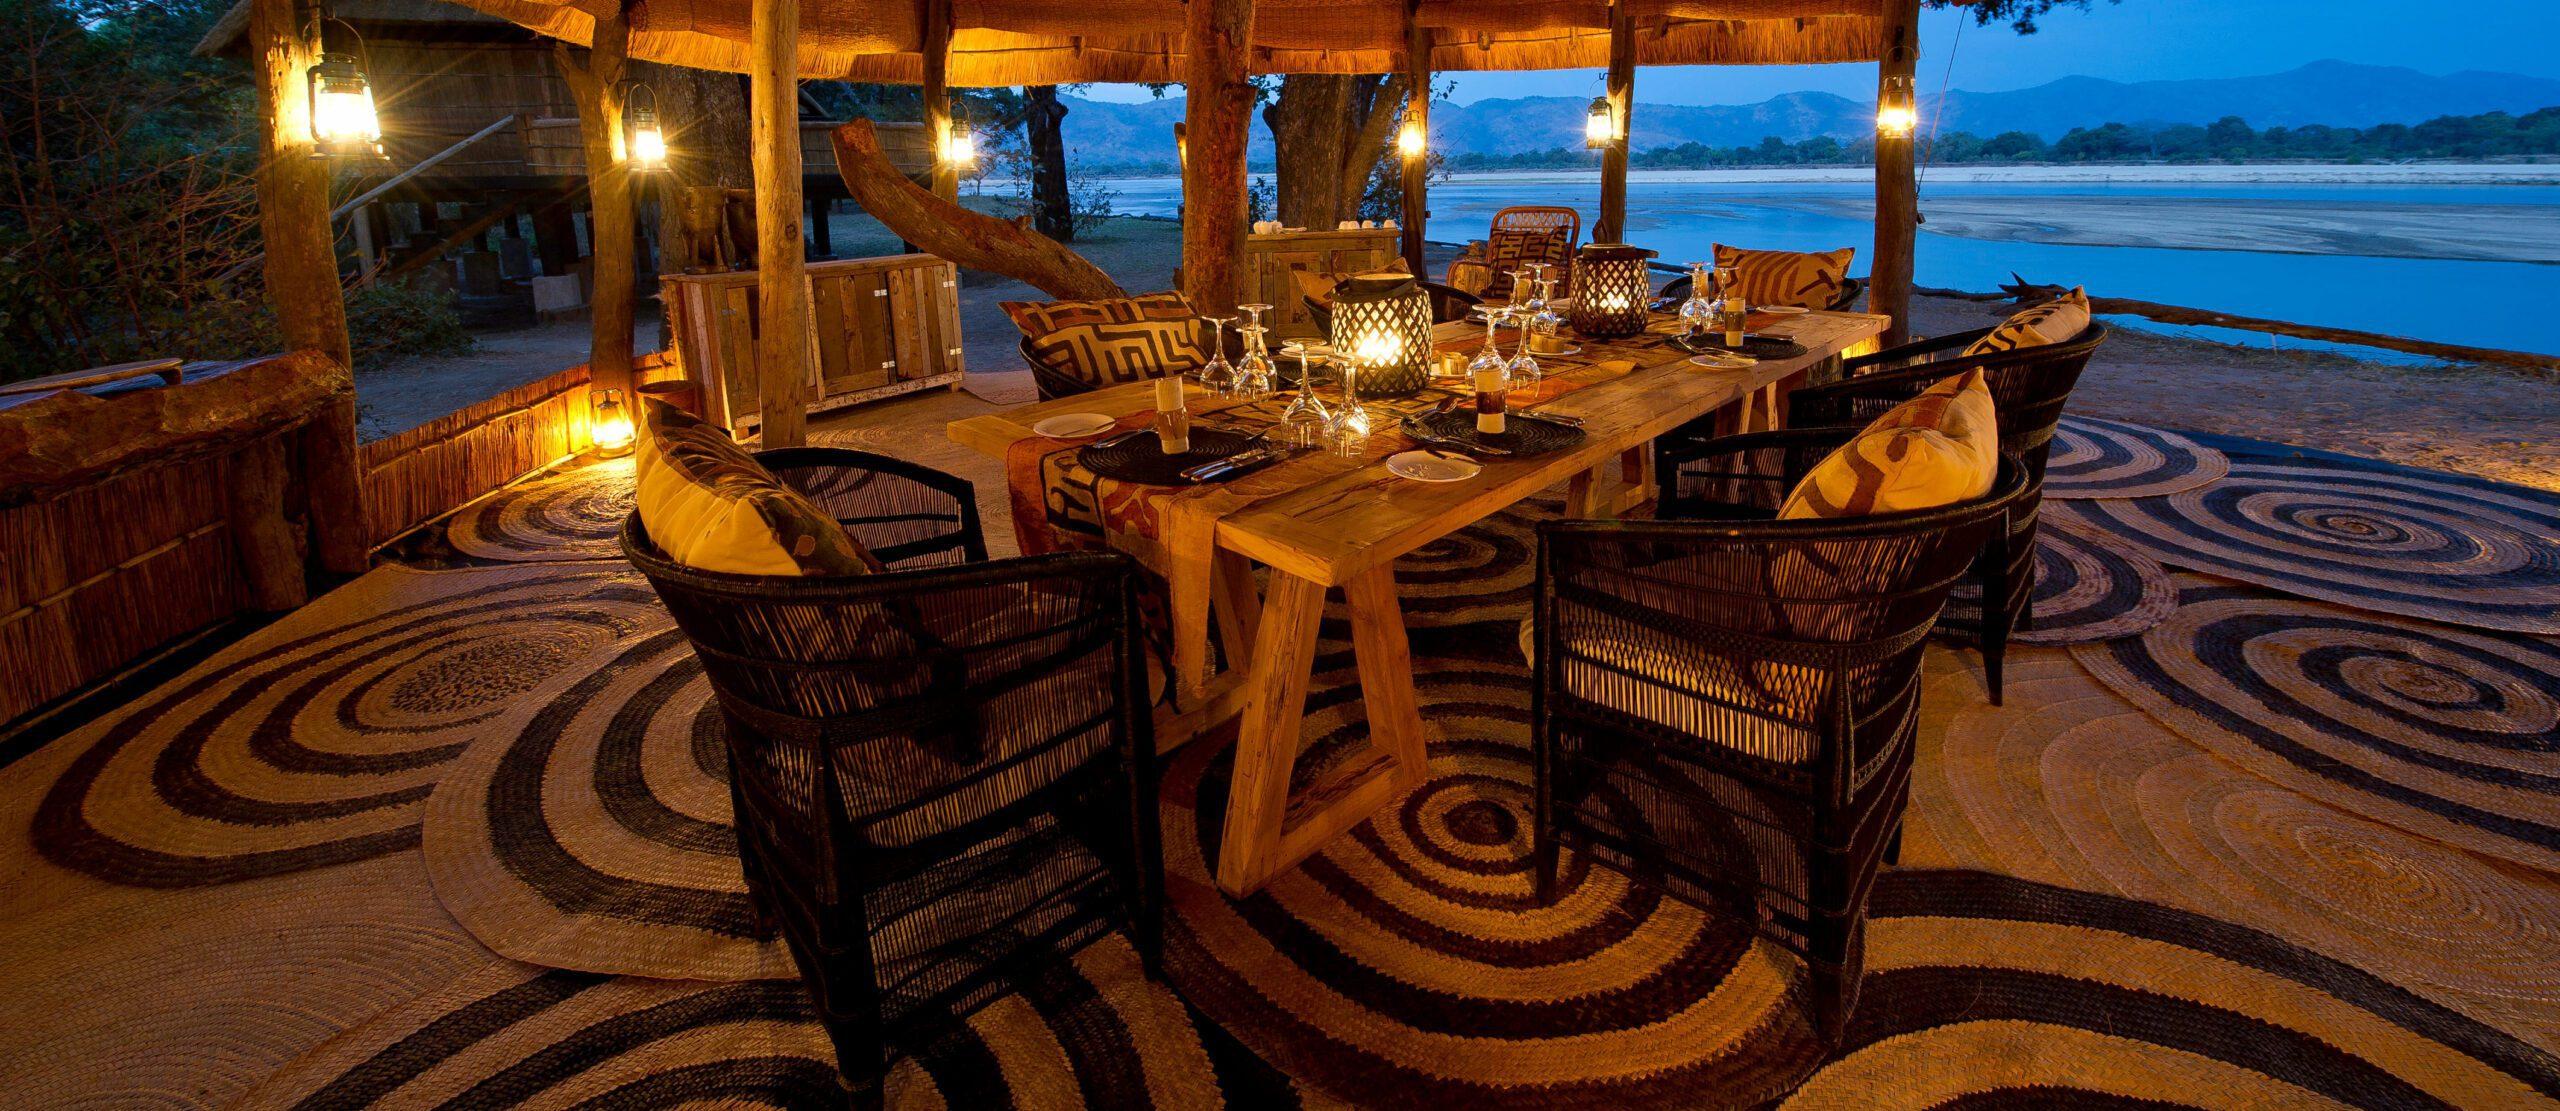 Dinner set up at Chamilandu